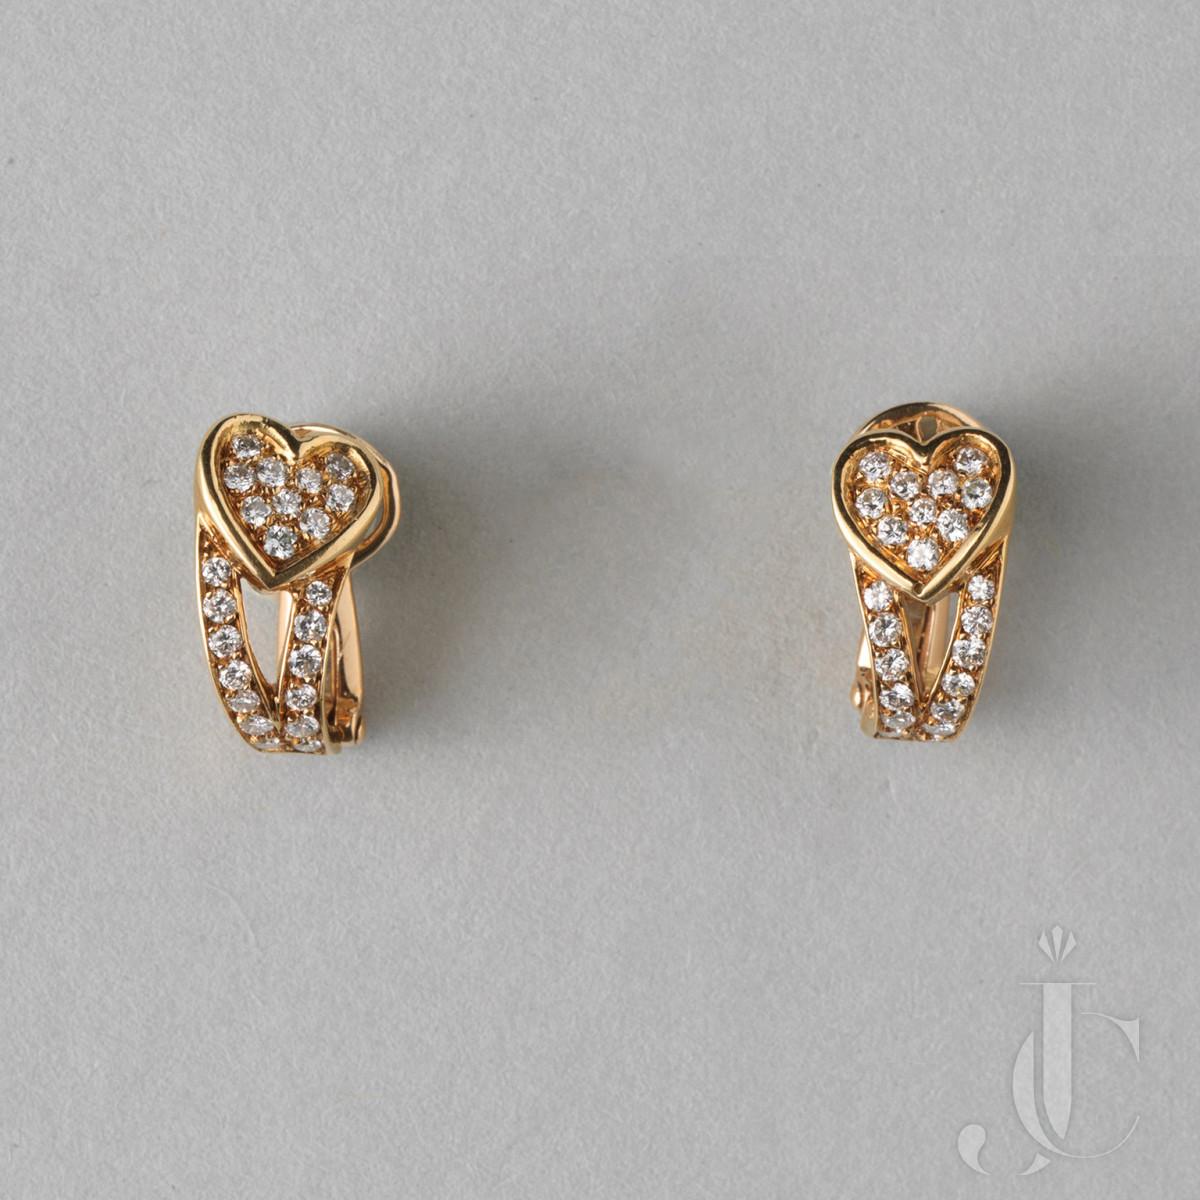 An 18 CARAT GOLD AND DIAMOND BOUCHERON HEART EAR CLIPS